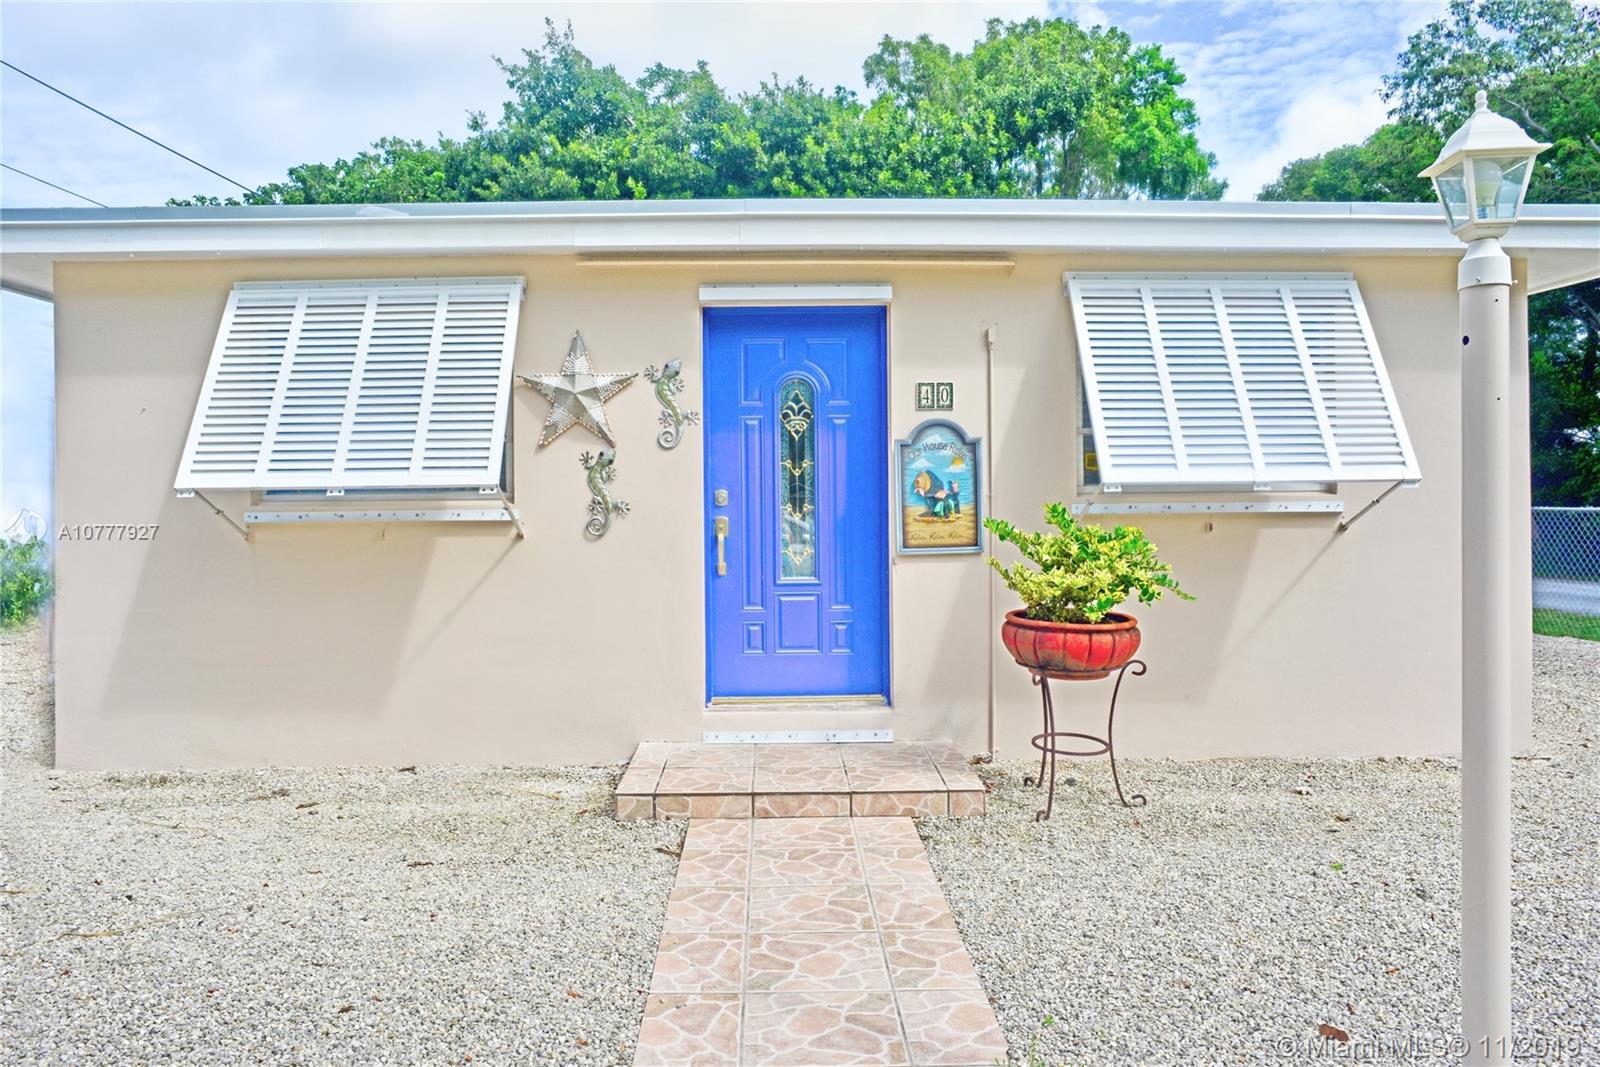 40 Transylvania Ave, Other City - Keys/Islands/Caribb, FL 33037 - Other City - Keys/Islands/Caribb, FL real estate listing